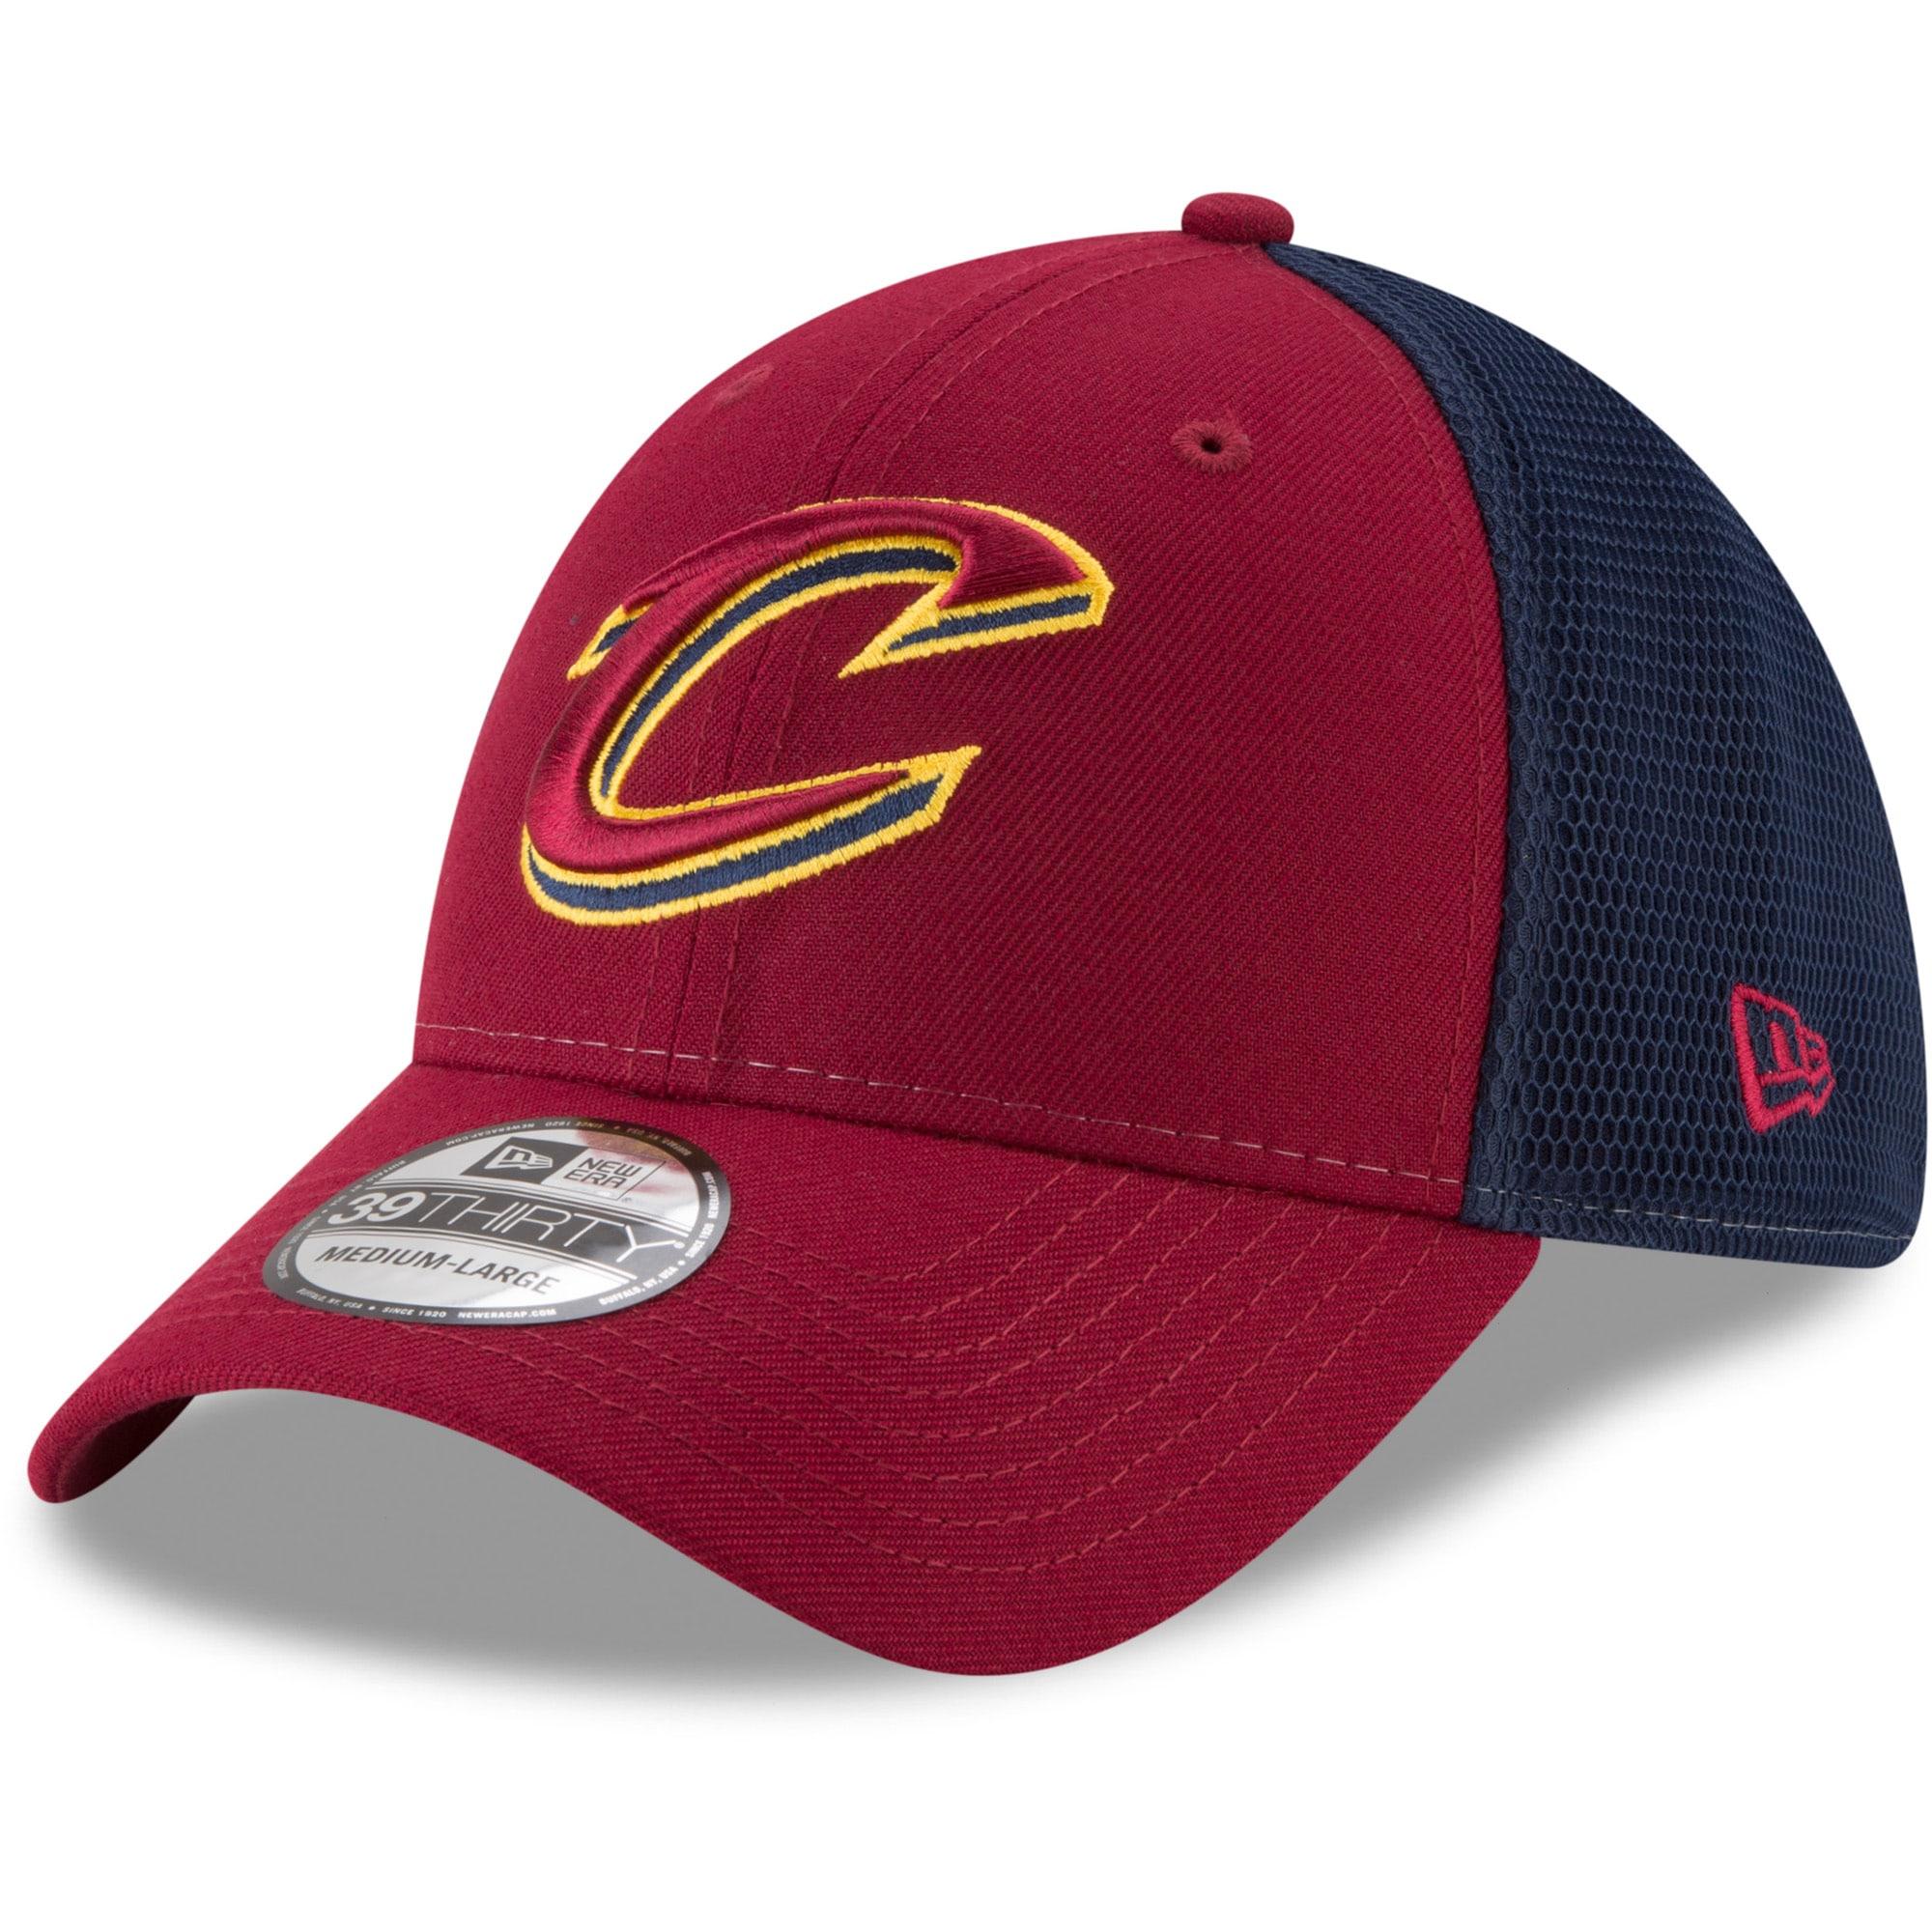 Cleveland Cavaliers New Era 2T Sided 39THIRTY Flex Hat - Wine